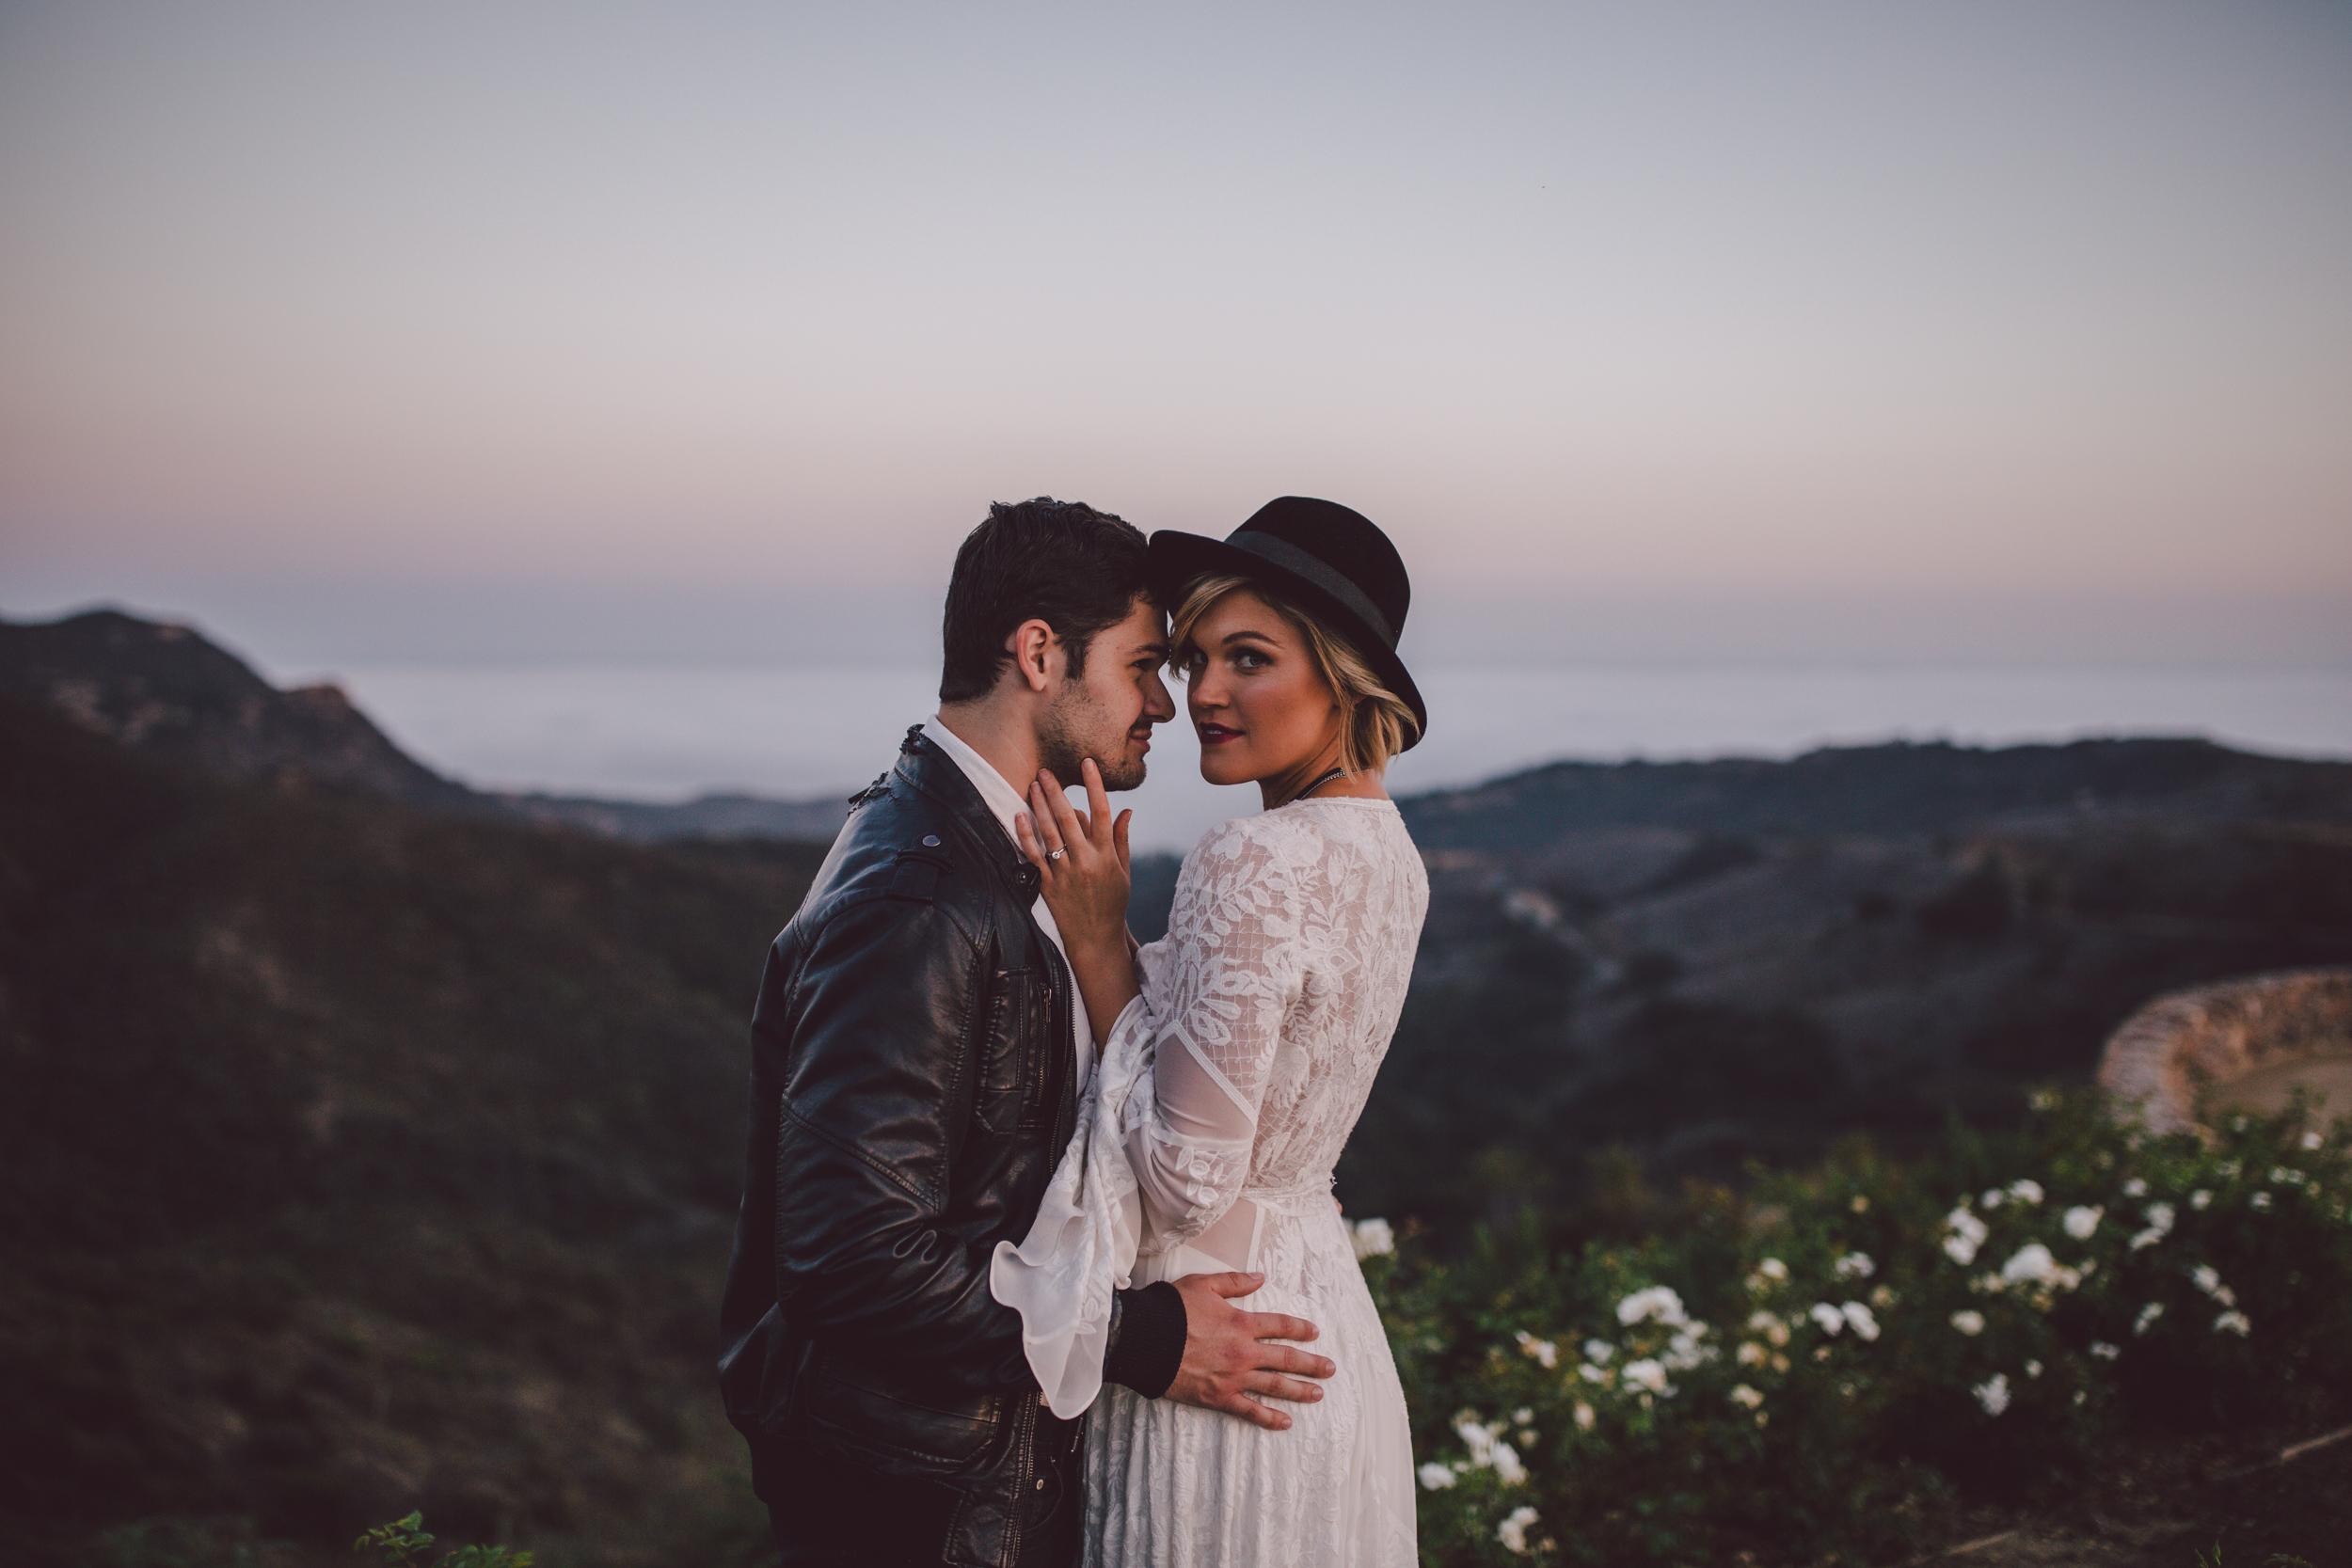 leather jacket-couple-malibu-stonewall ranch-lovely bride-rue de seine